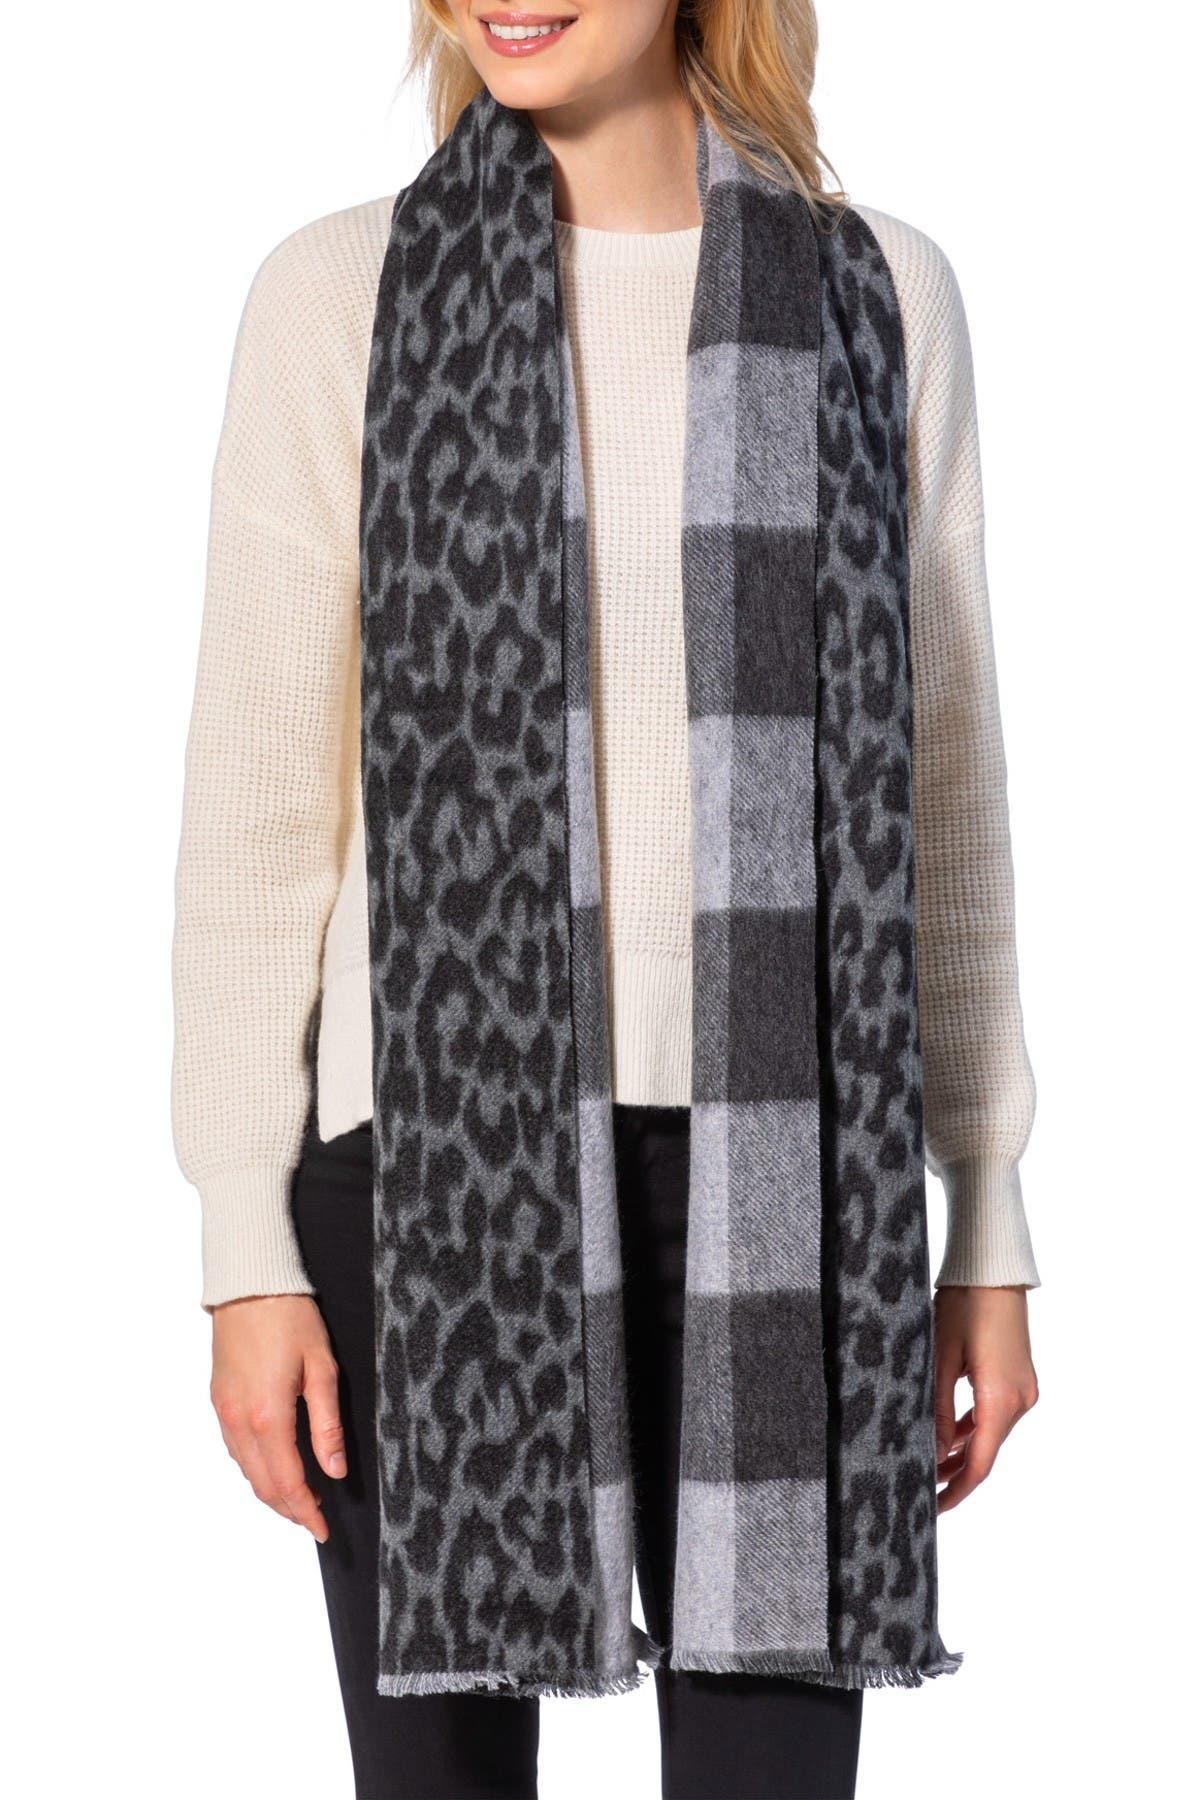 Image of AMICALE Cashmere Leopard/Buffalo Plaid Print Double Face Wrap